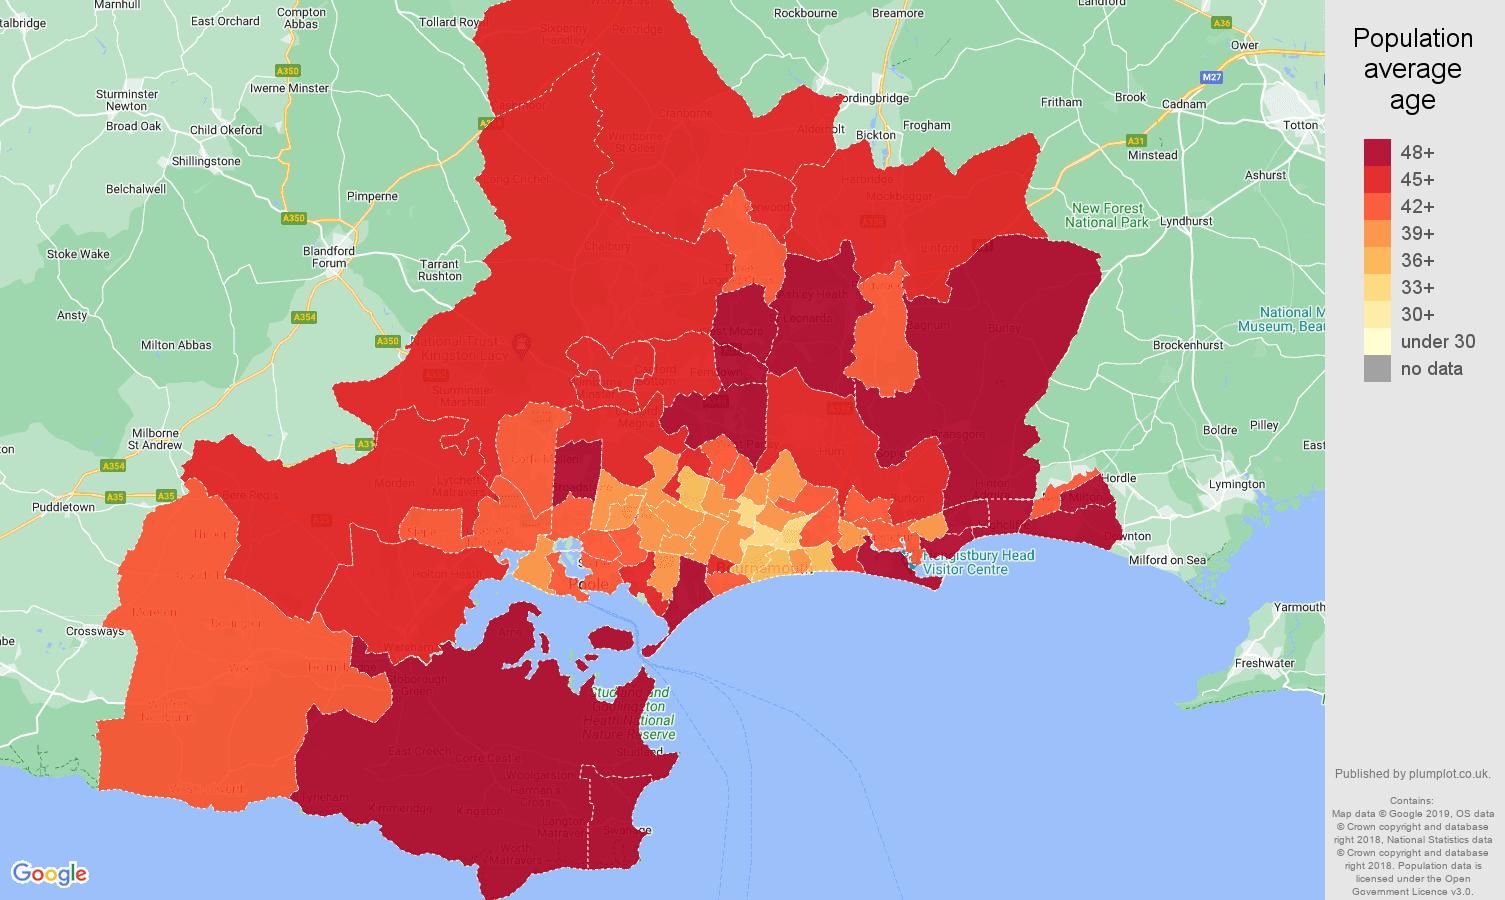 Bournemouth population average age map